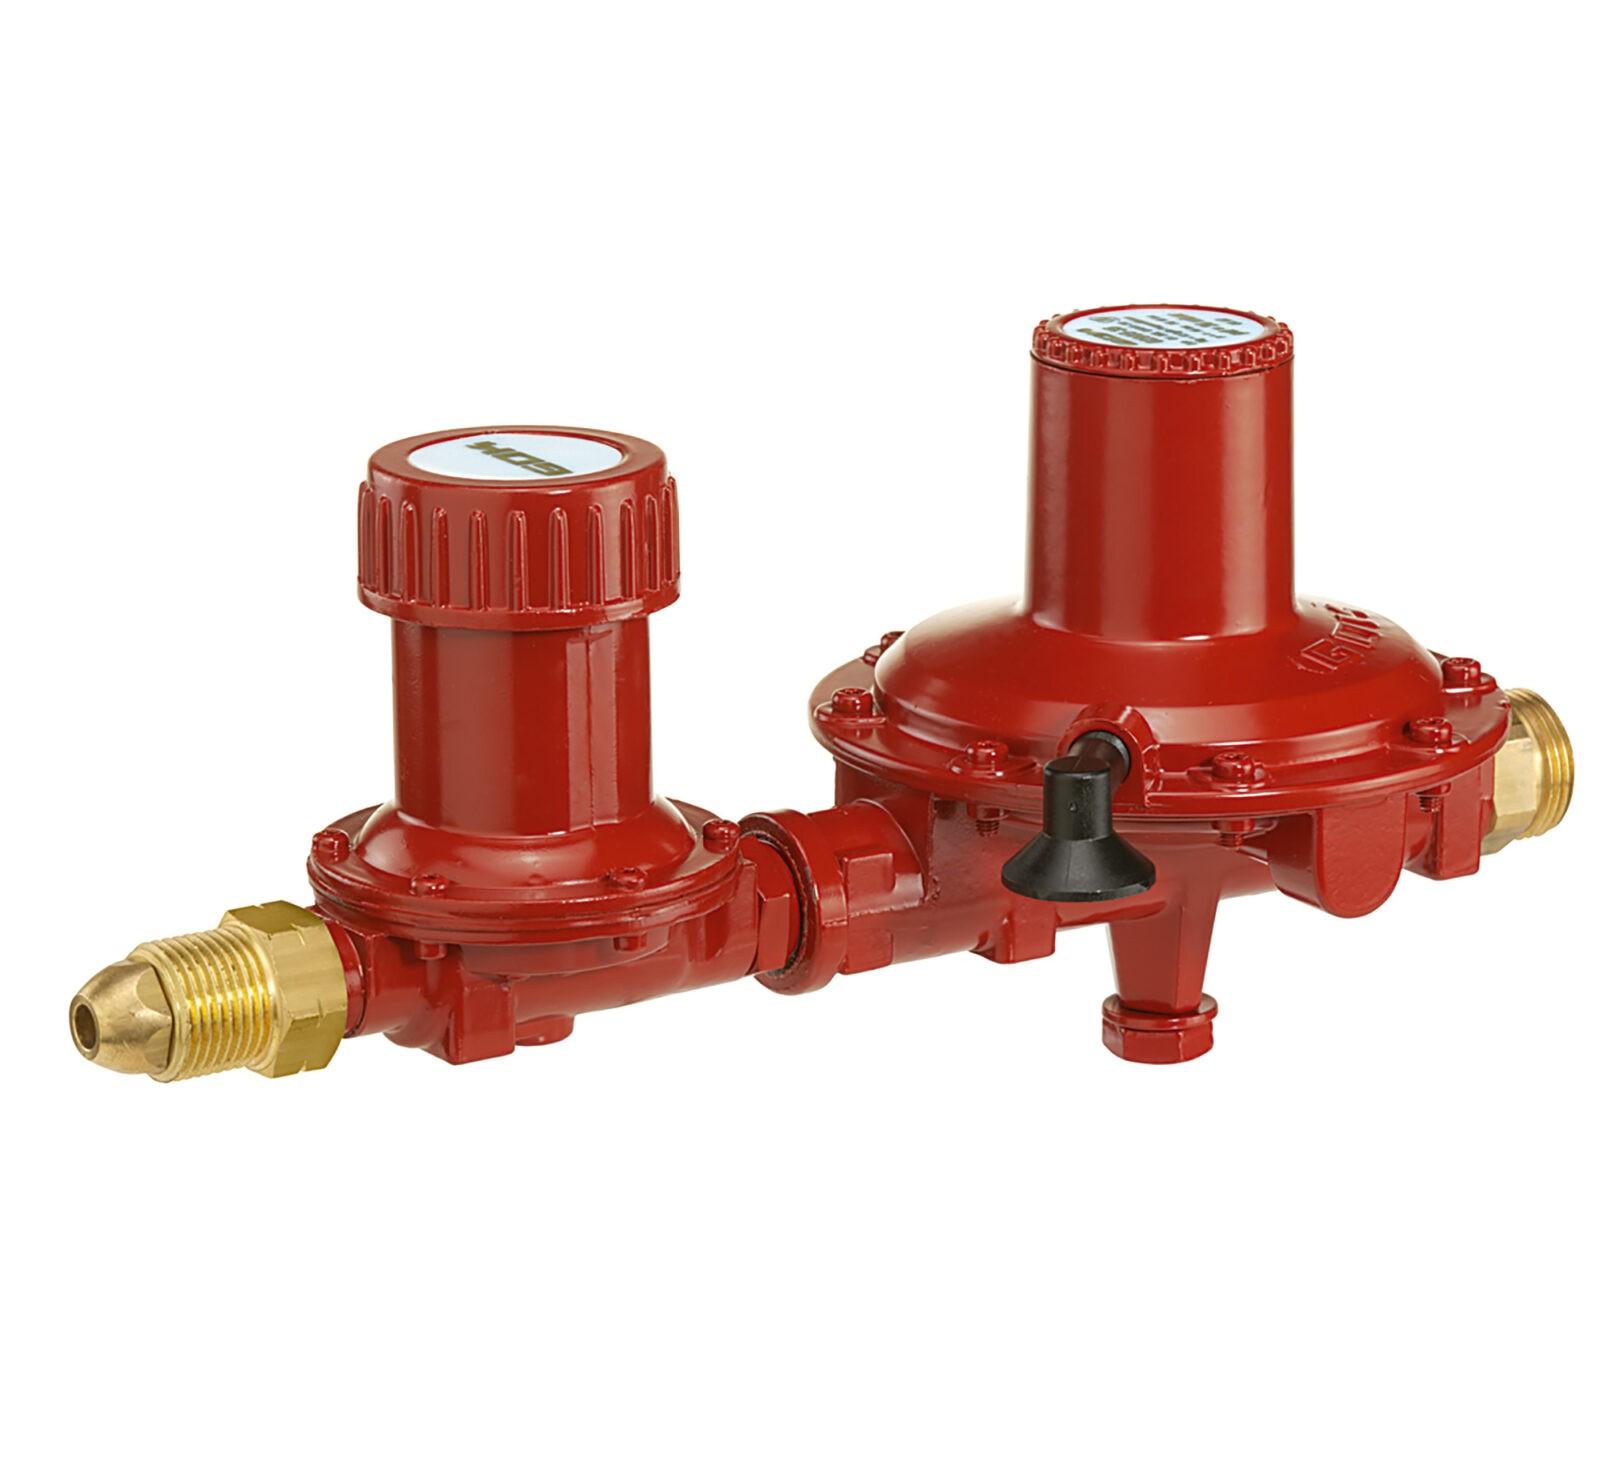 Регулятор давления газа GOK 12кг/час 37-50мбар POLxIG G1/2 ПСК